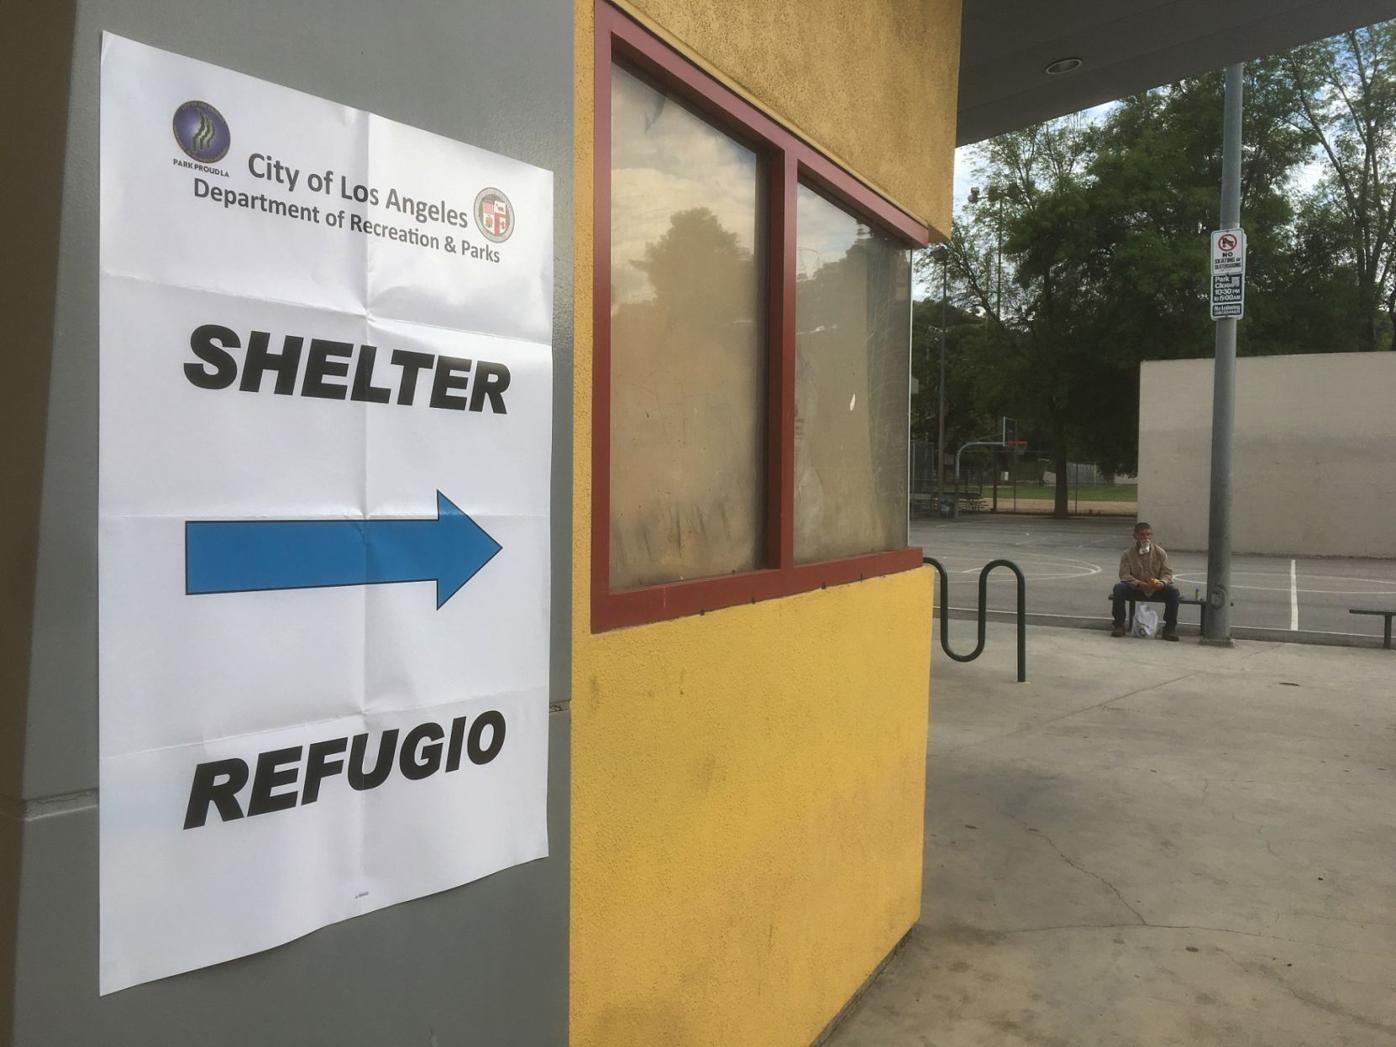 Homeless shelter at the Yosemite Recreation Center